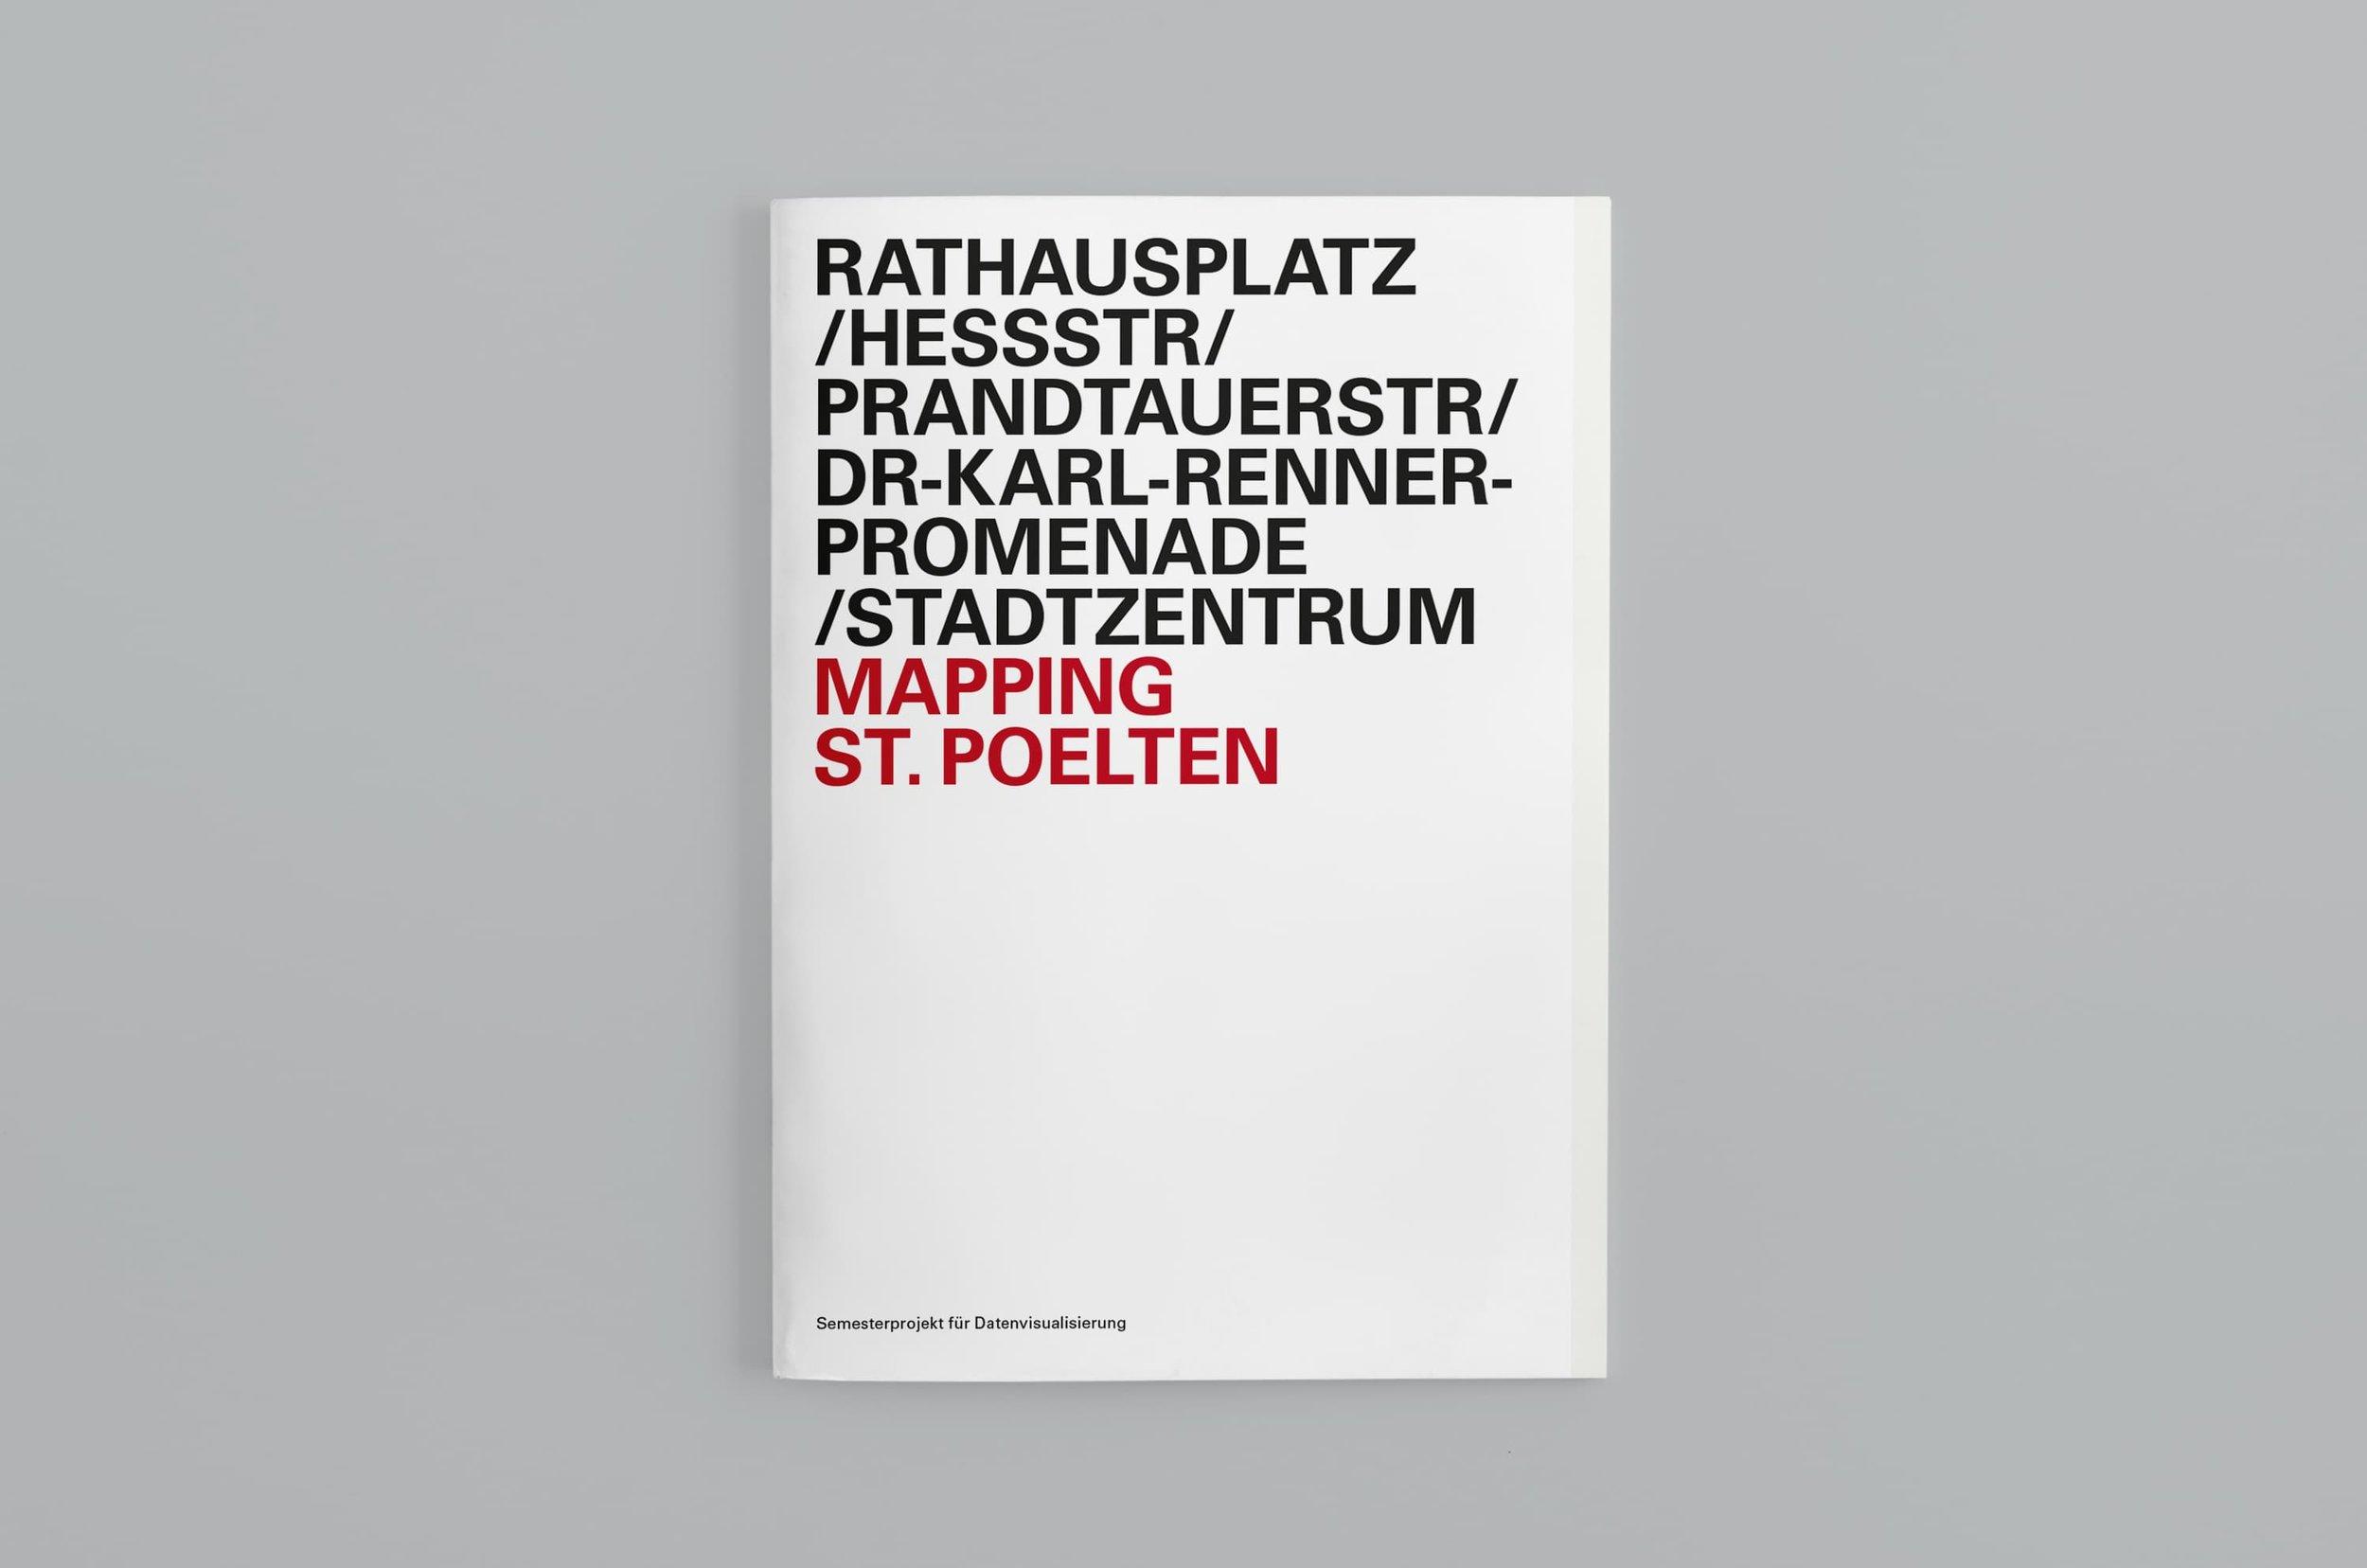 10_ndu-Brochure-Datenanalyse_1.jpg